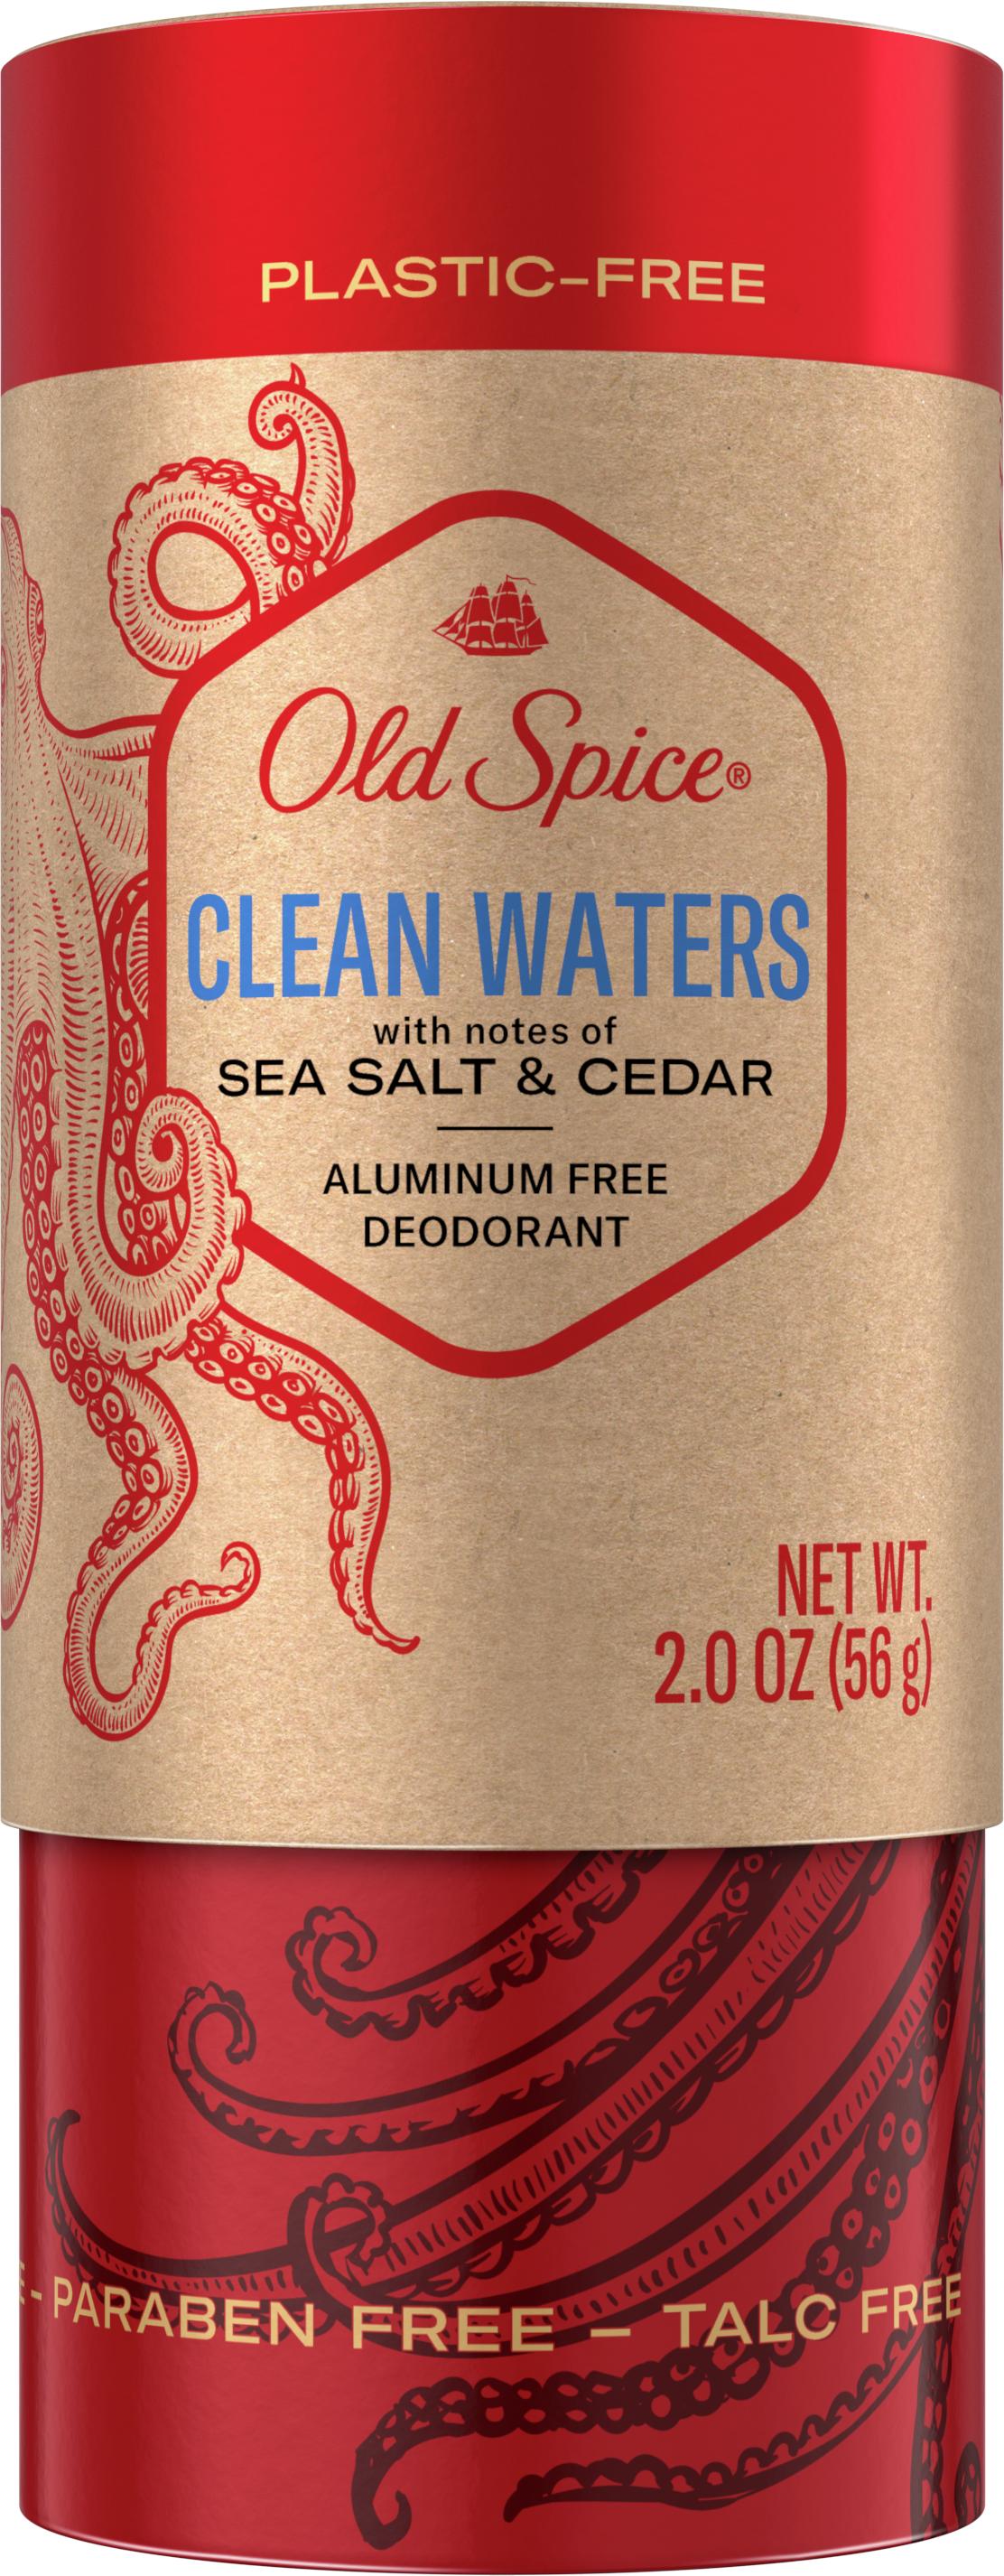 Clean Waters Plastic-Free Aluminum Free Deodorant